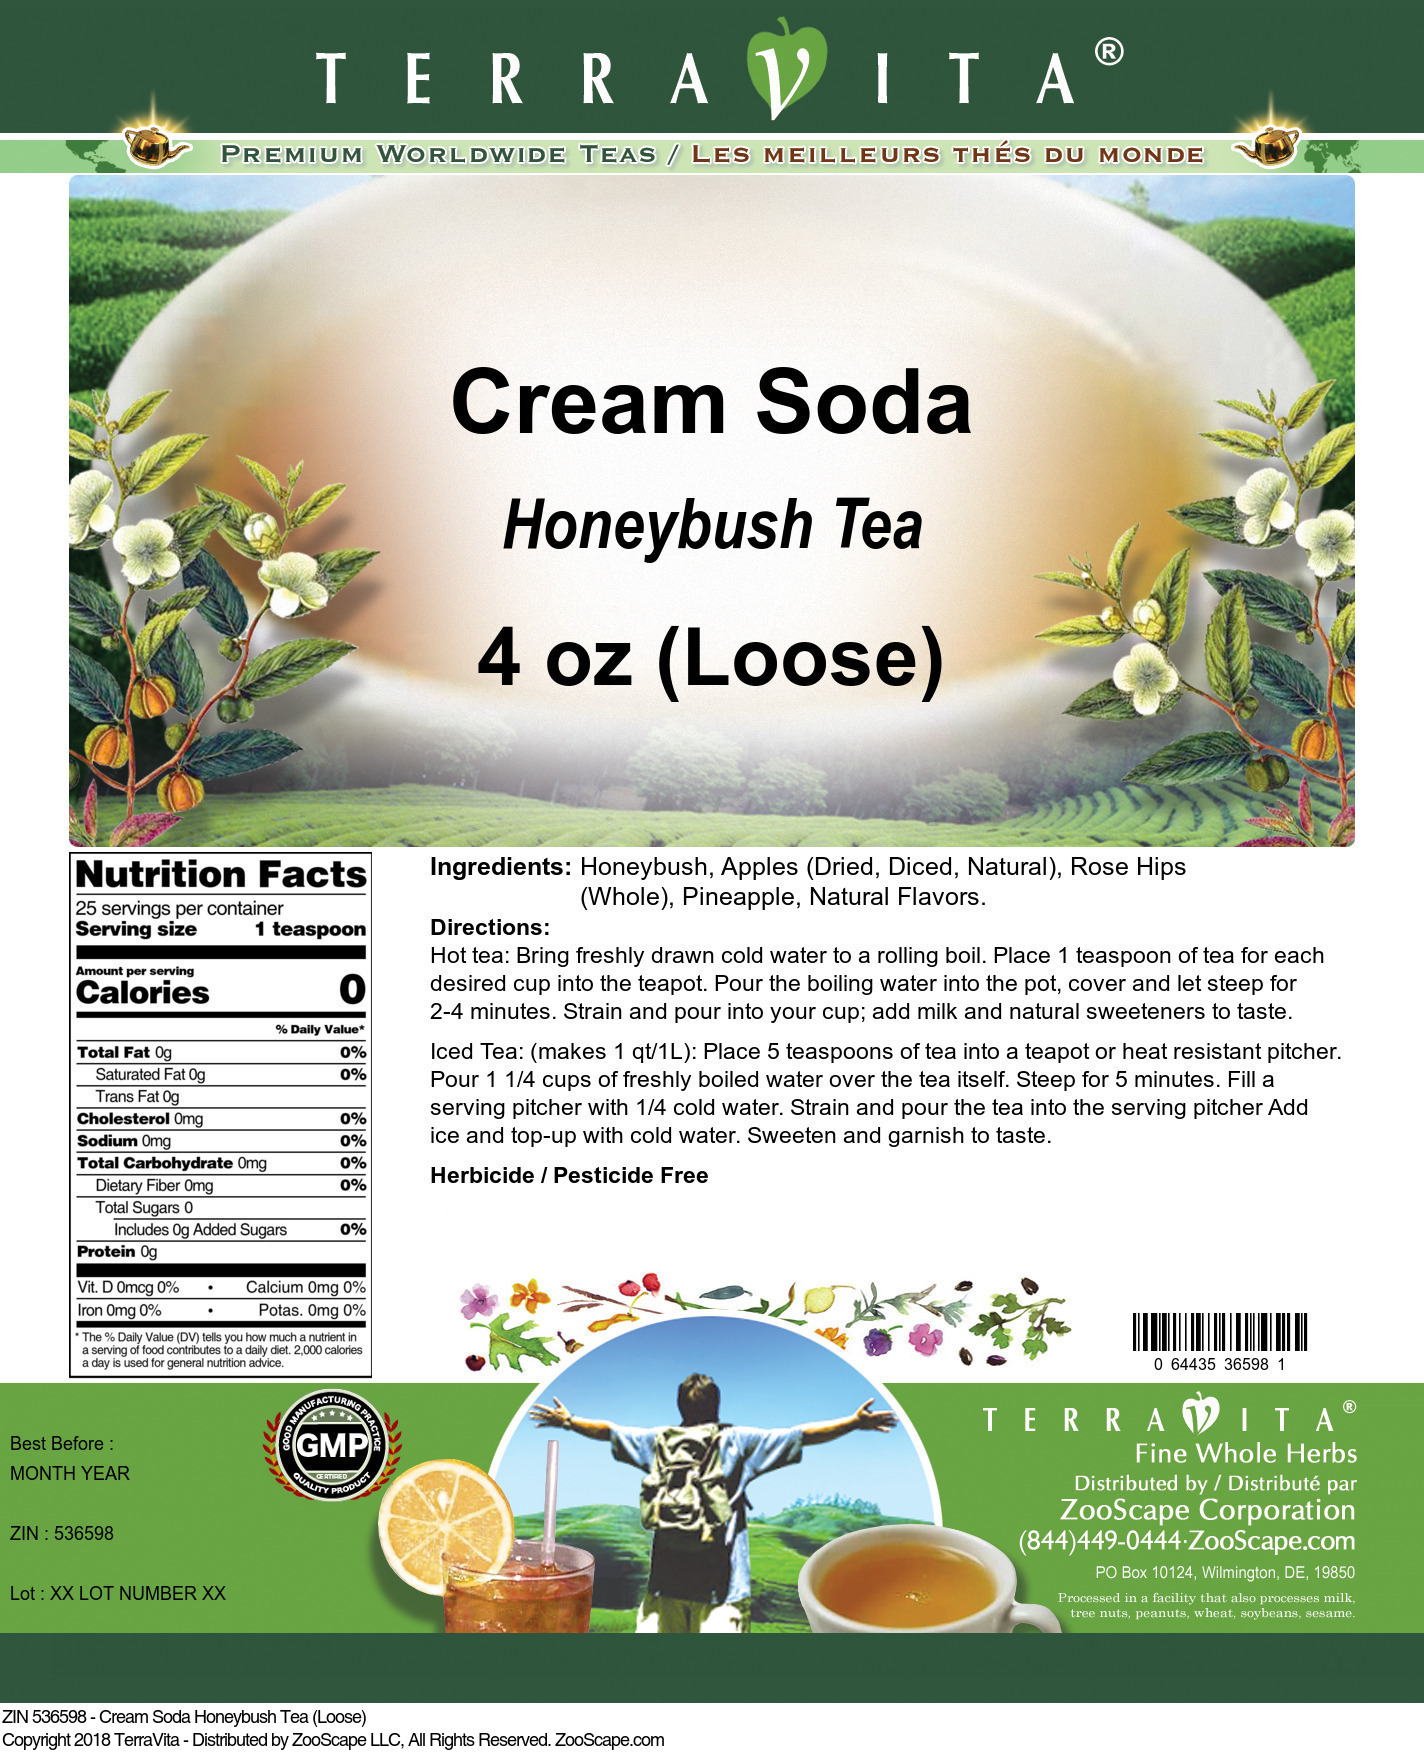 Cream Soda Honeybush Tea